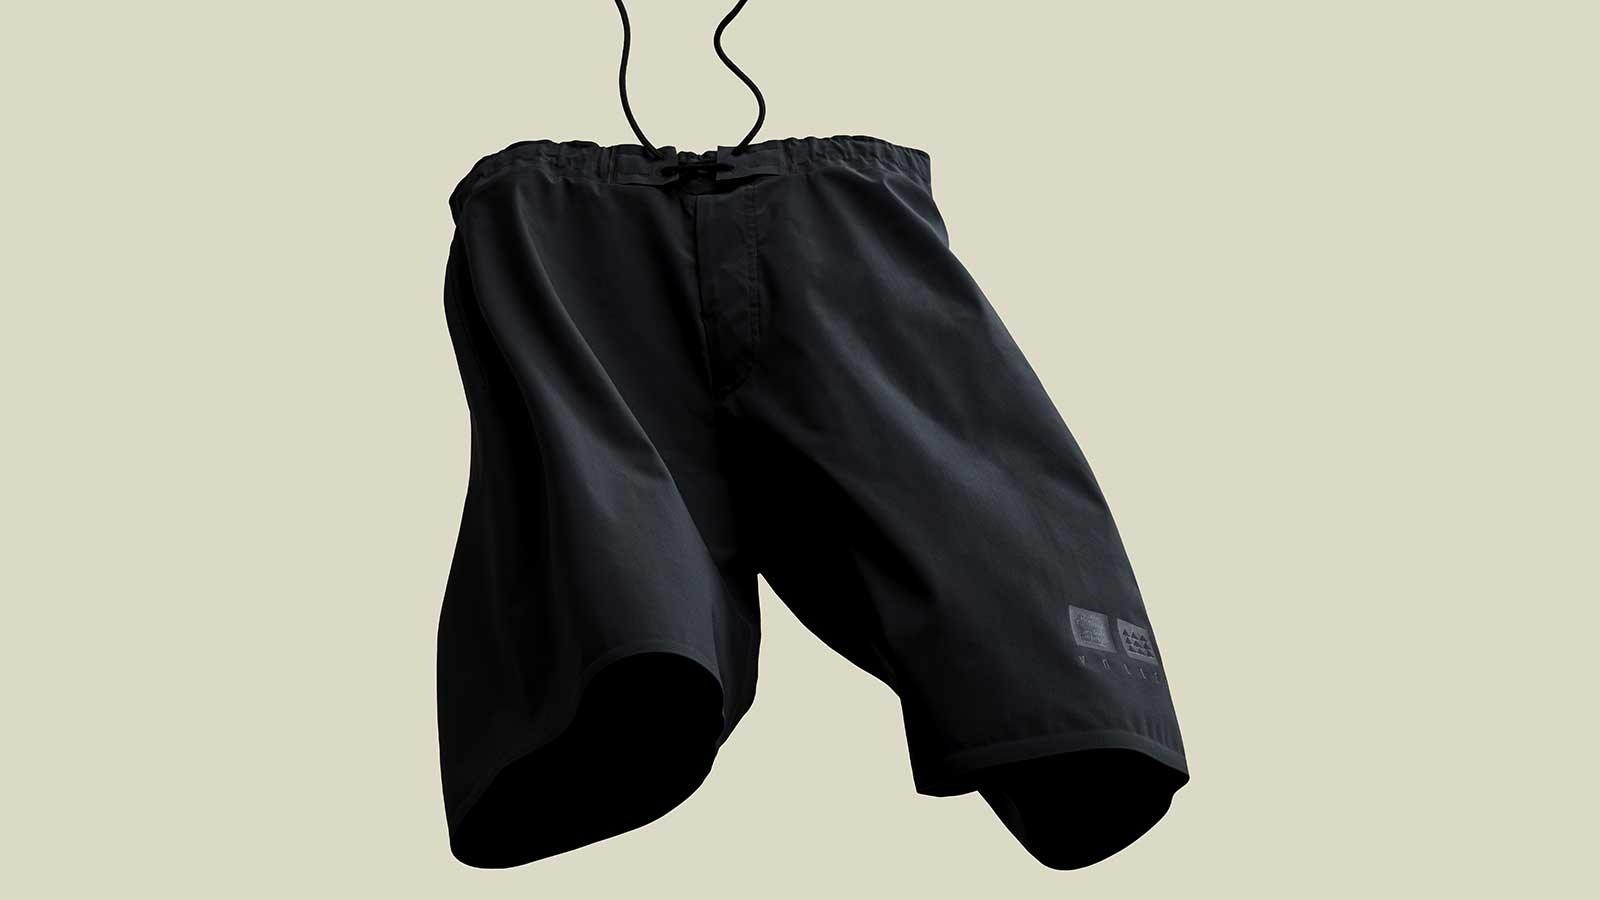 The Vollebak Ocean Shorts